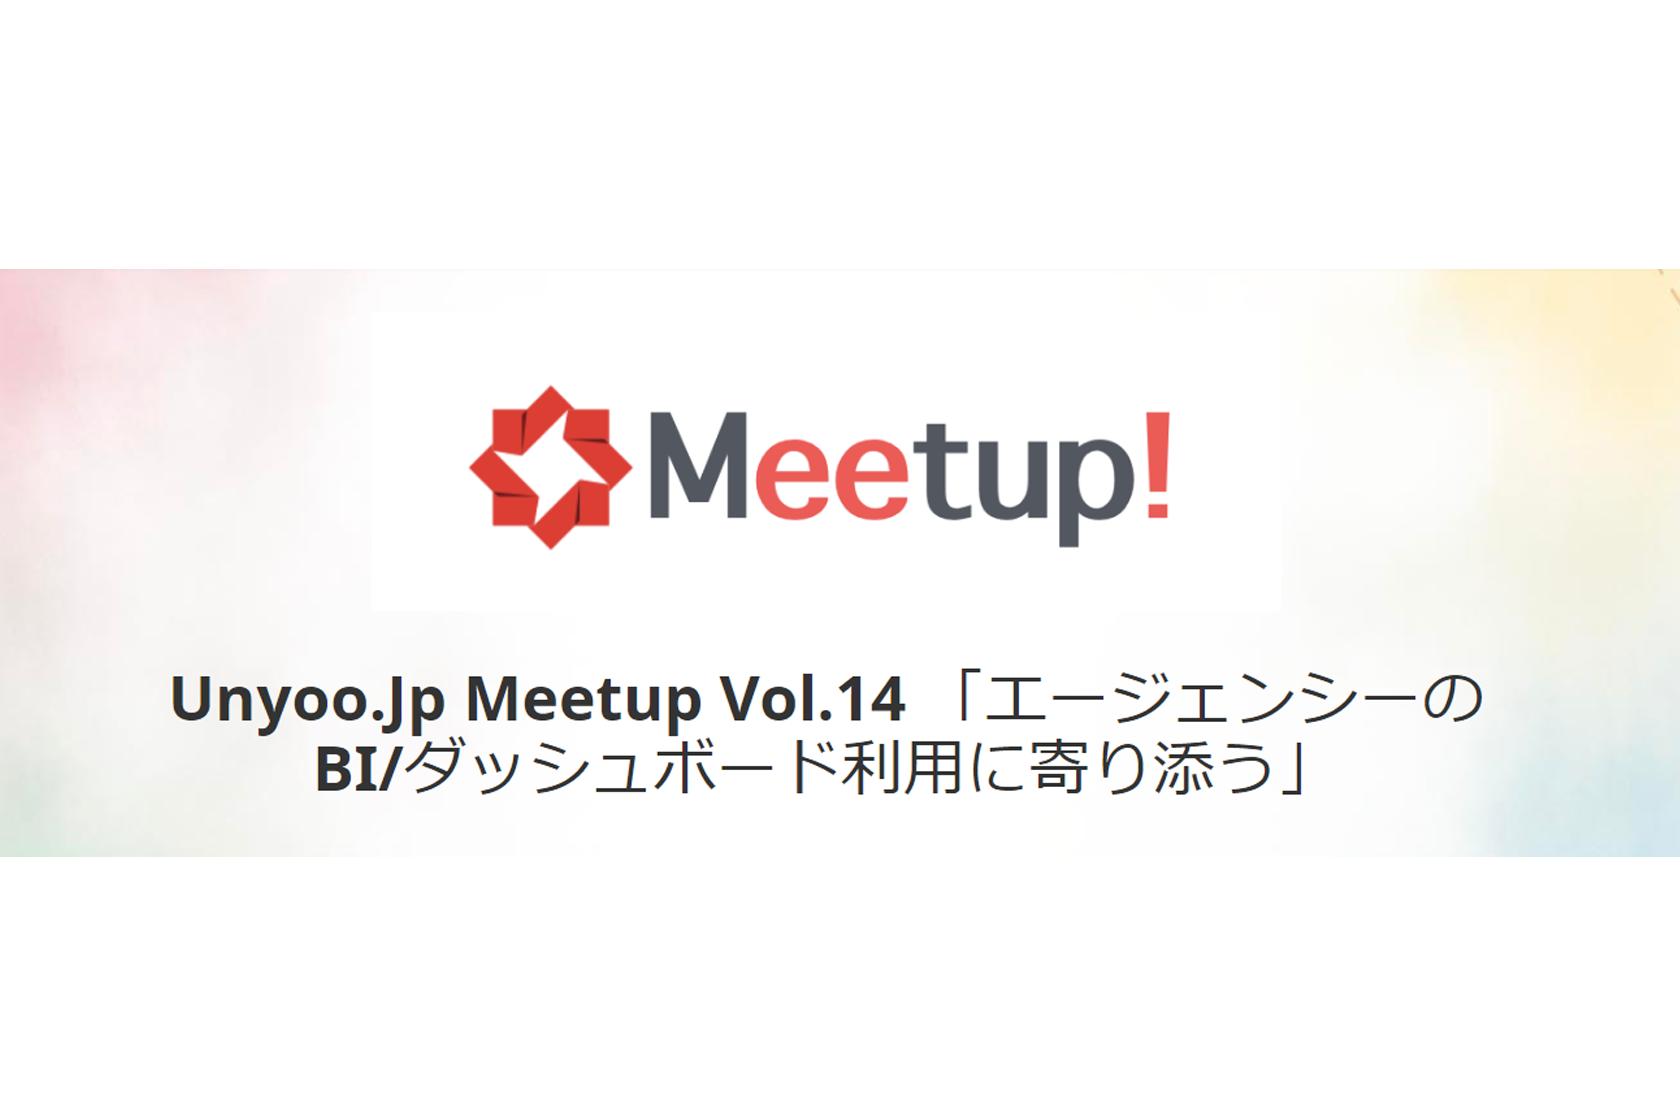 Unyoo.Jp Meetup Vol.14 「エージェンシーのBI/ダッシュボード利用に寄り添う」に登壇が決定いたしました